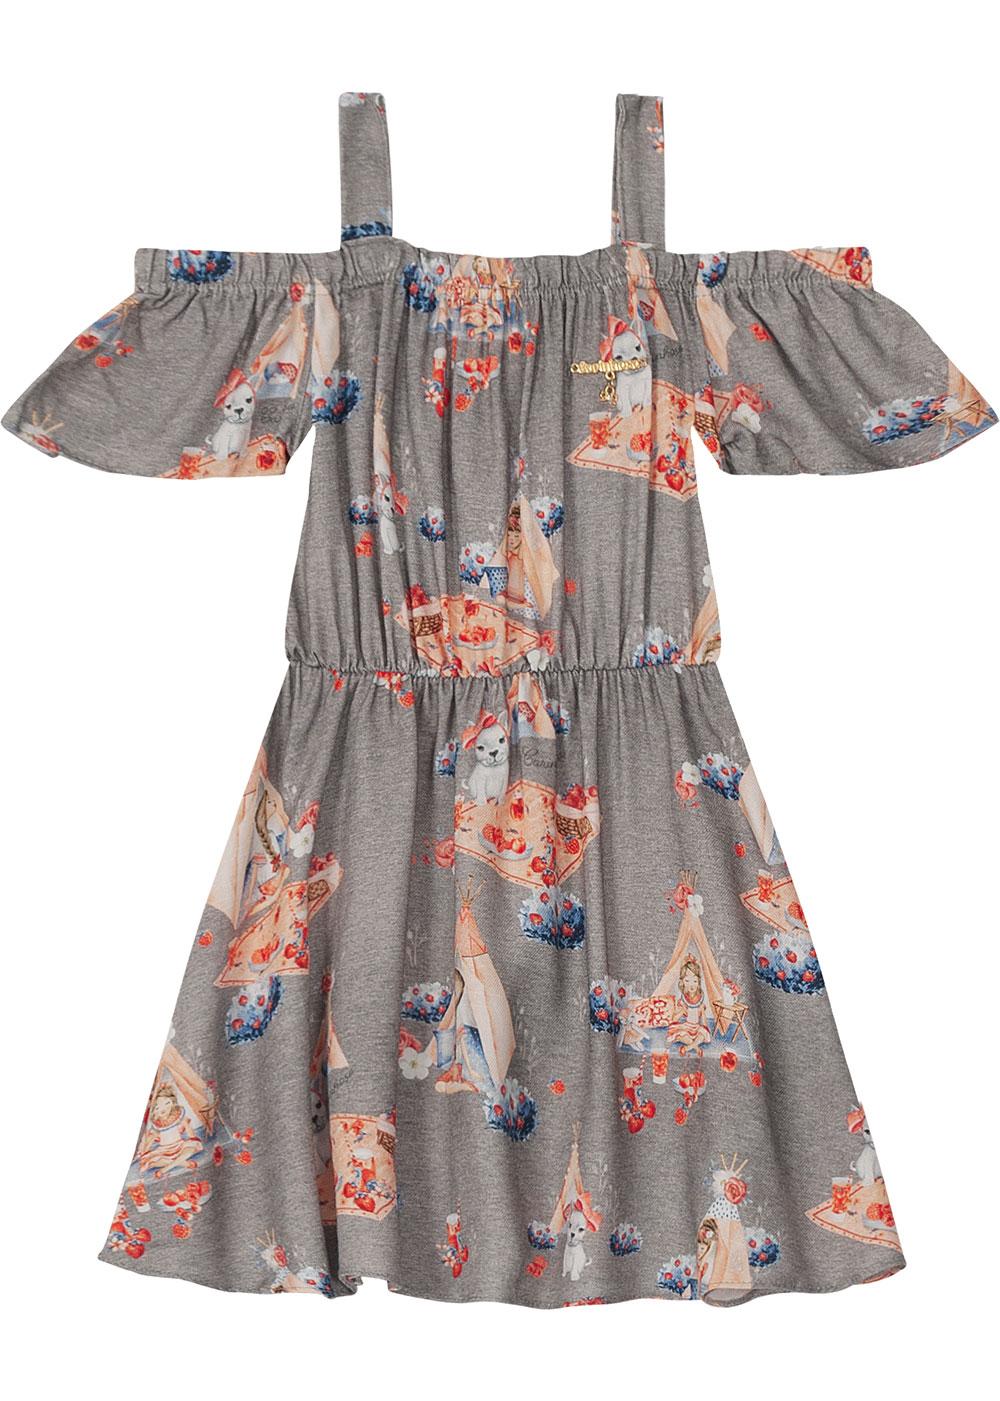 Vestido Infantil Curto Cinza Piquenique - Carinhoso